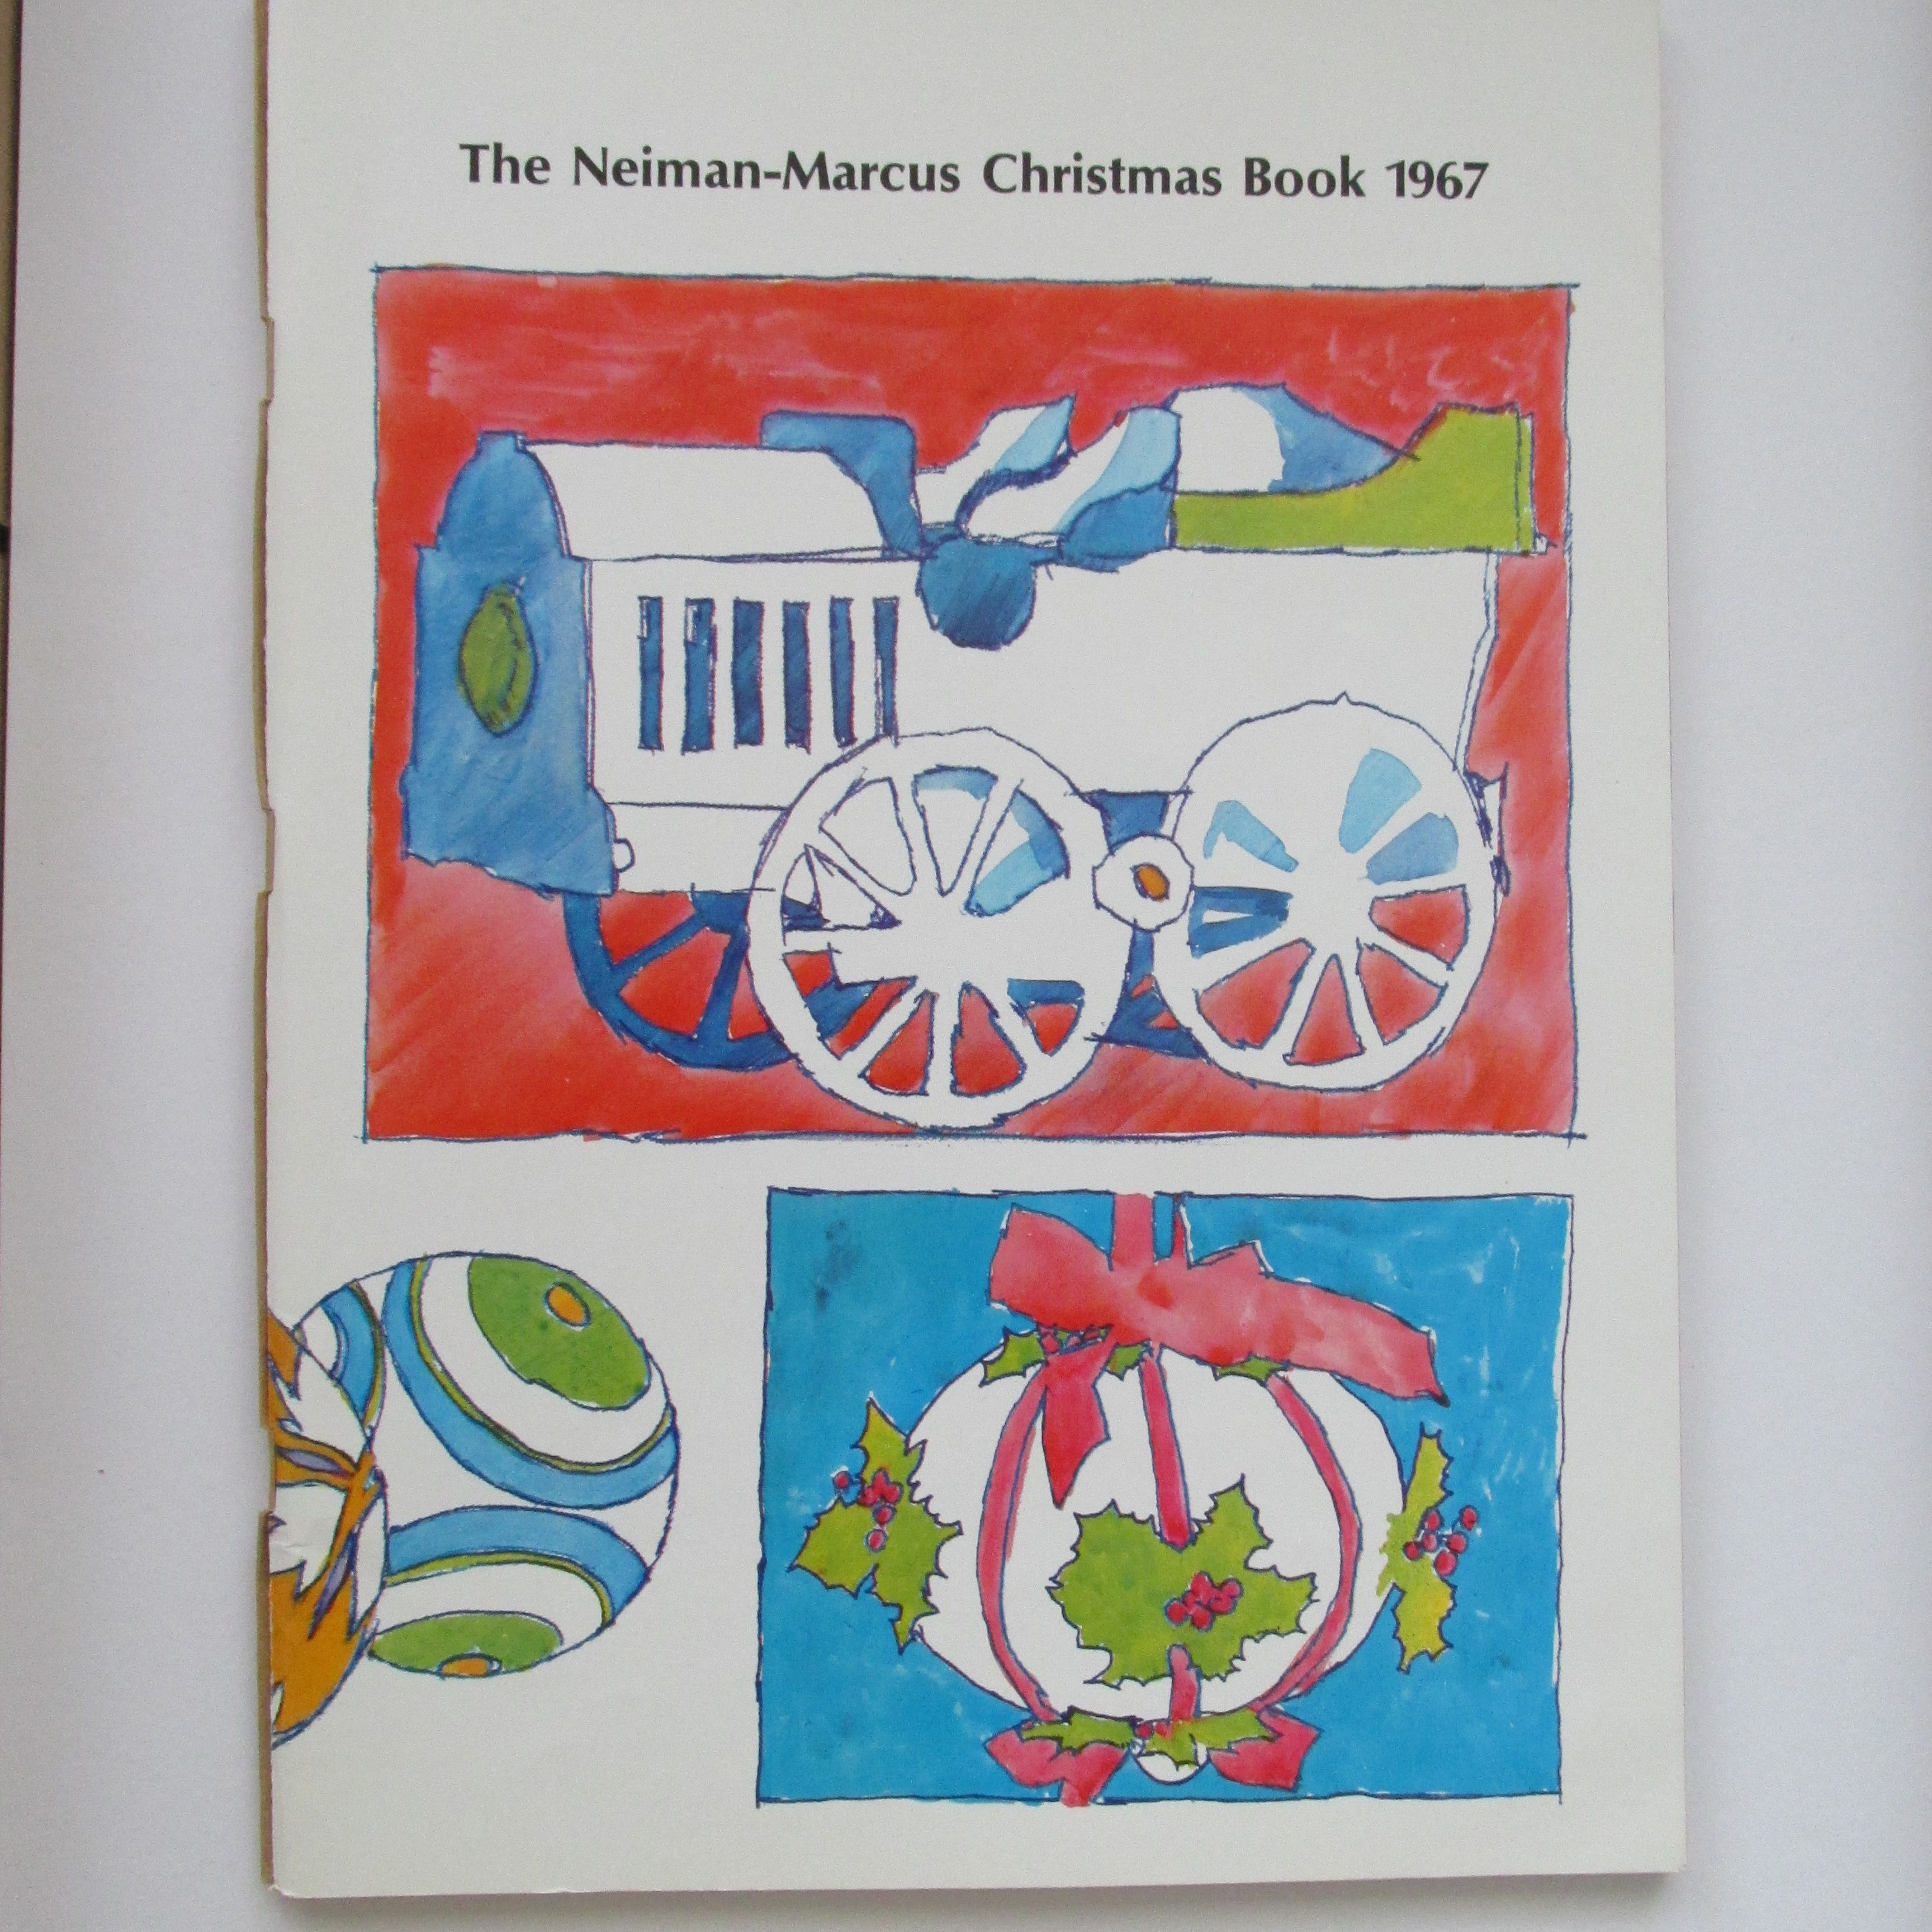 Neiman Marcus Christmas Book.Neiman Marcus Christmas Book 1967 Meet The Press Neiman